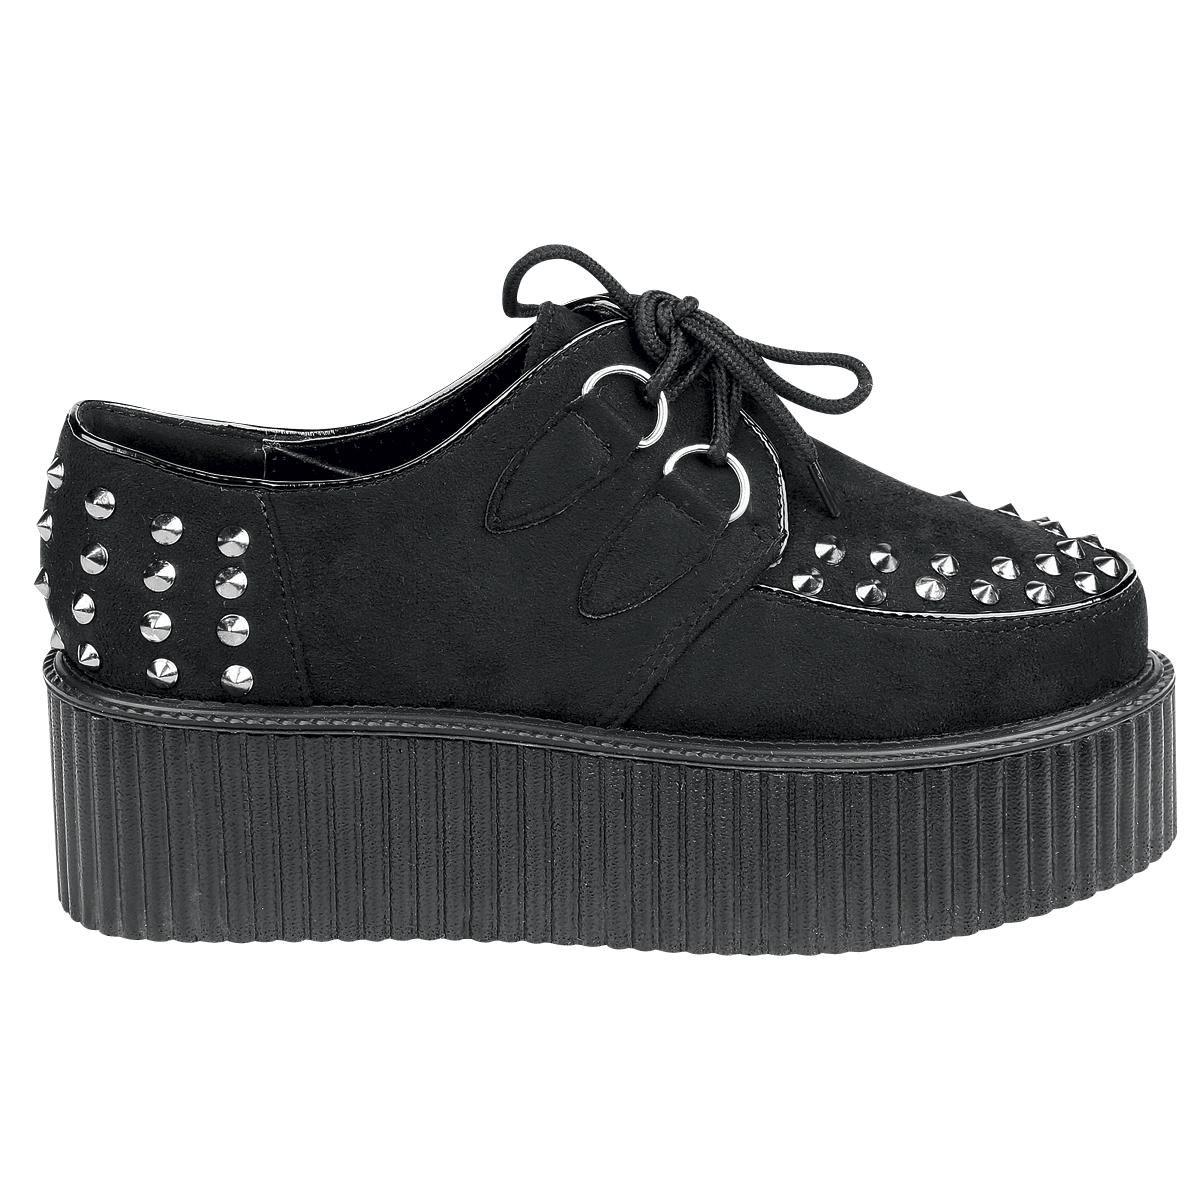 Creepers Stud Chaussures Emp Noir Pm0Lq2